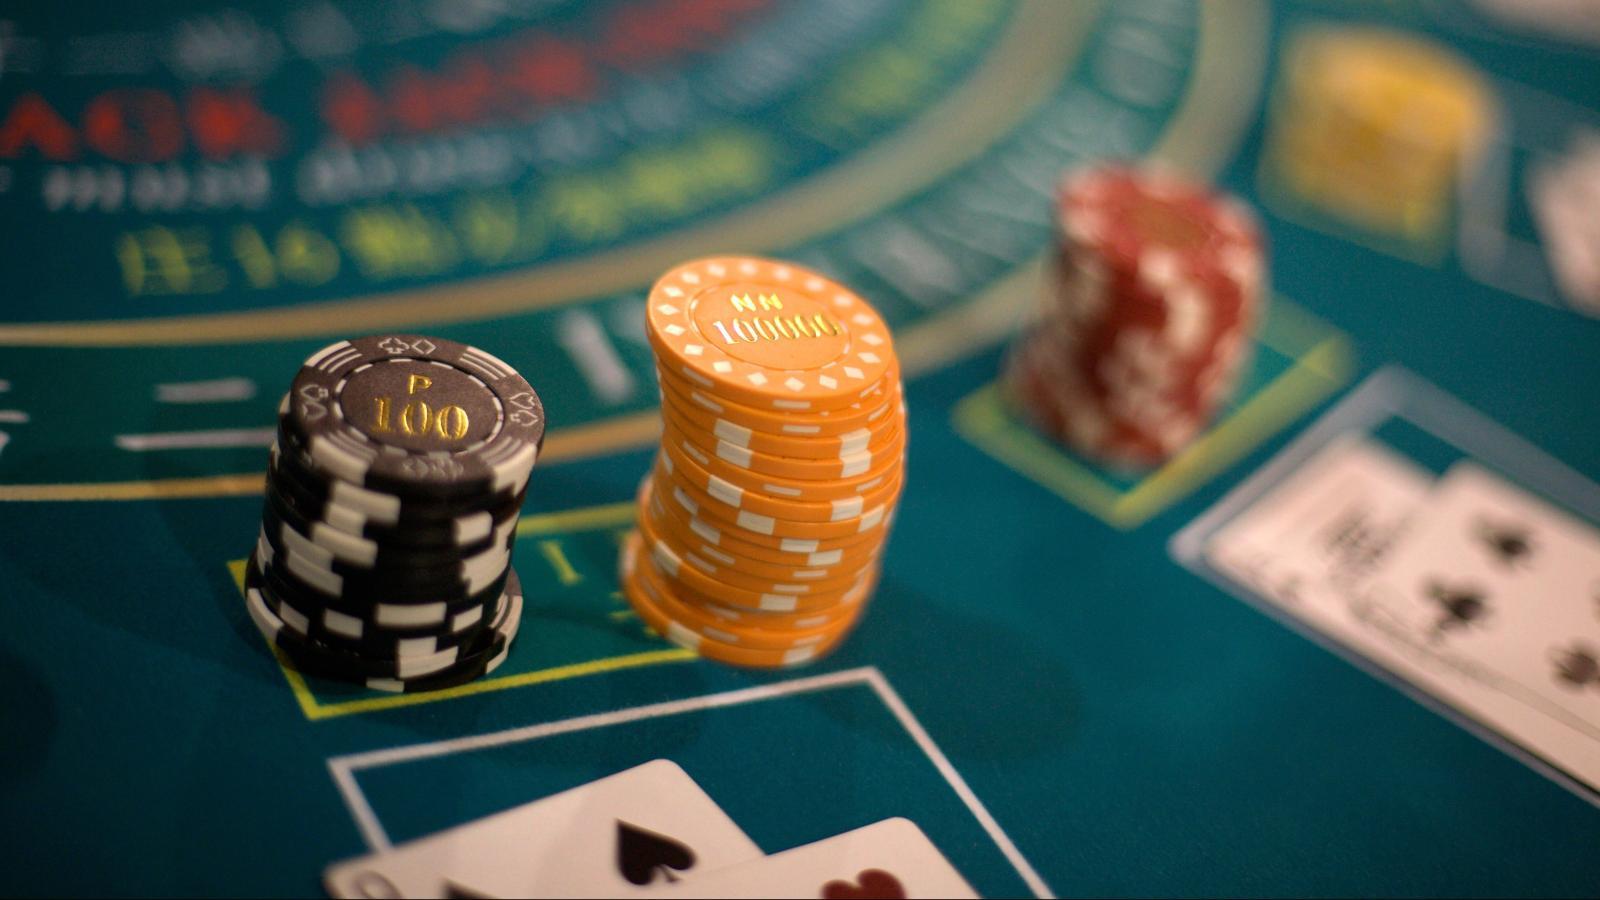 Transformation of traditional casinos into online casinos